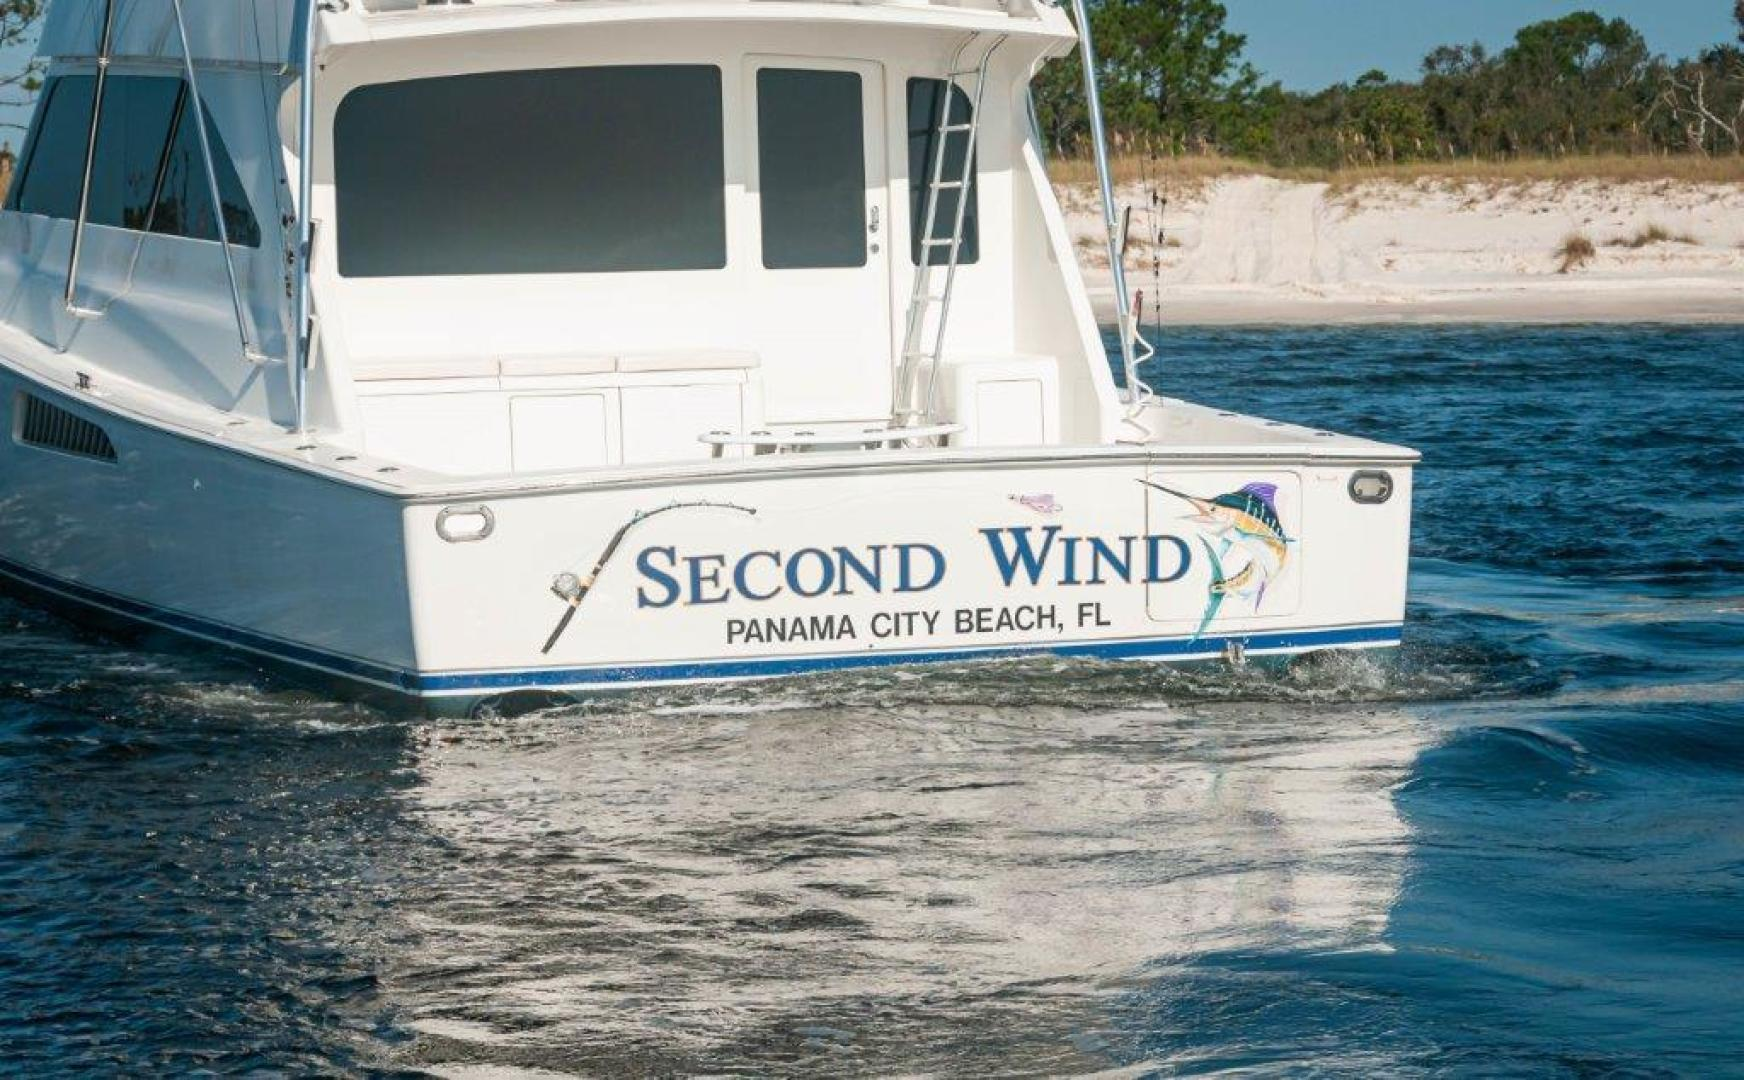 Viking-61 Convertible 2004-Second Wind Panama City Beach-Florida-United States-2004 61 Viking Convertible Second Wind Transom (1)-1545121 | Thumbnail